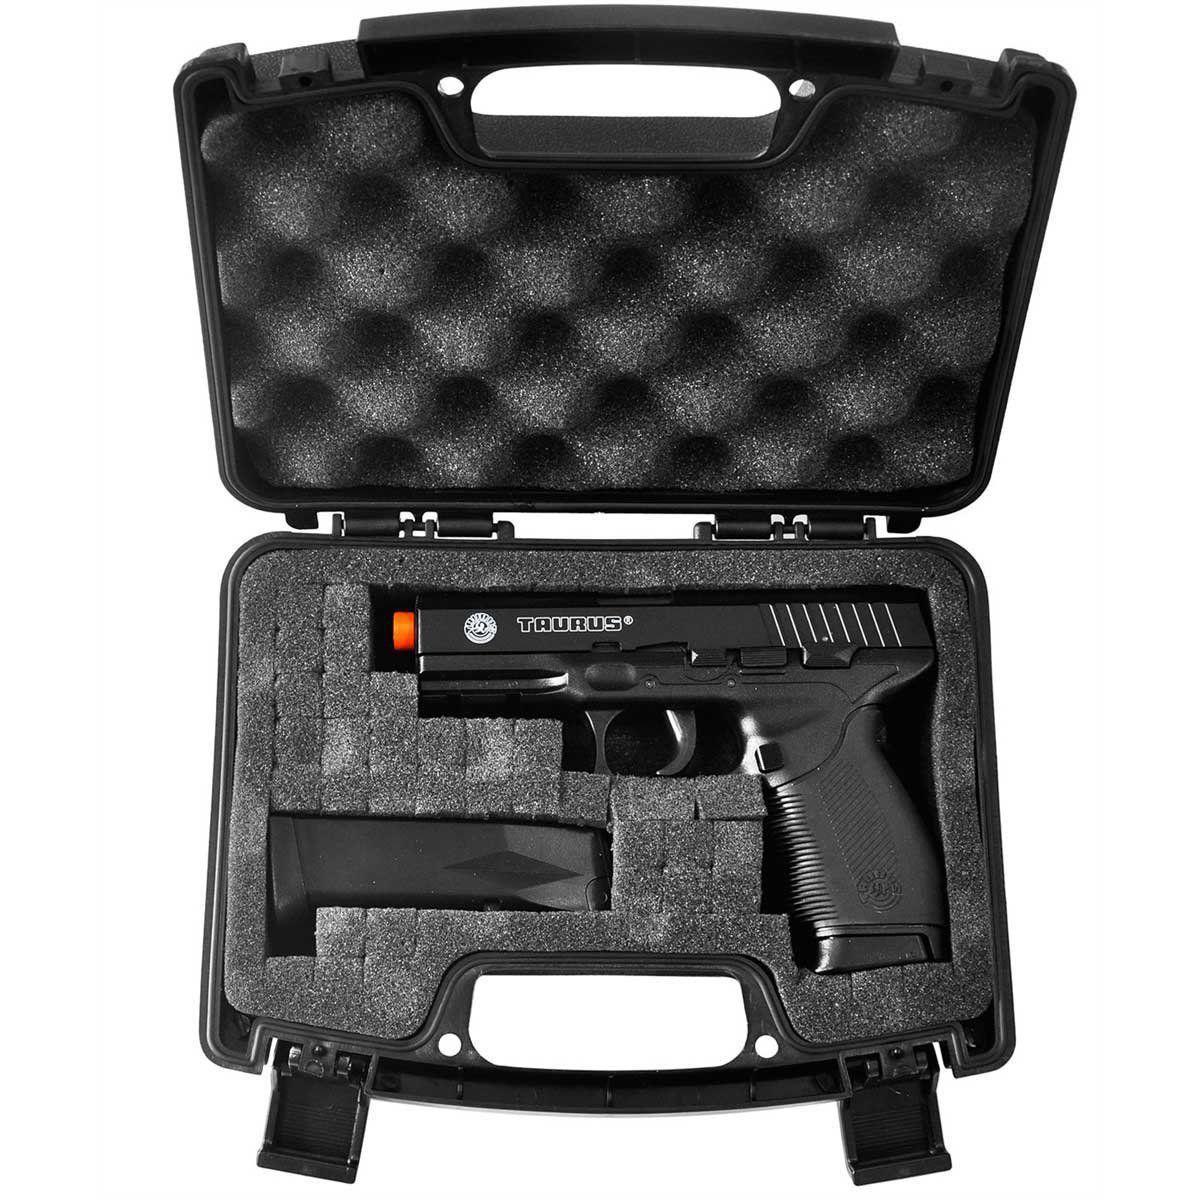 Kit Pistola Airsoft Co2 Sigsauer Sp2022 6mm Slide Metal Fixo + Maleta NTK + 2000 BBs  - Combat Airsoft